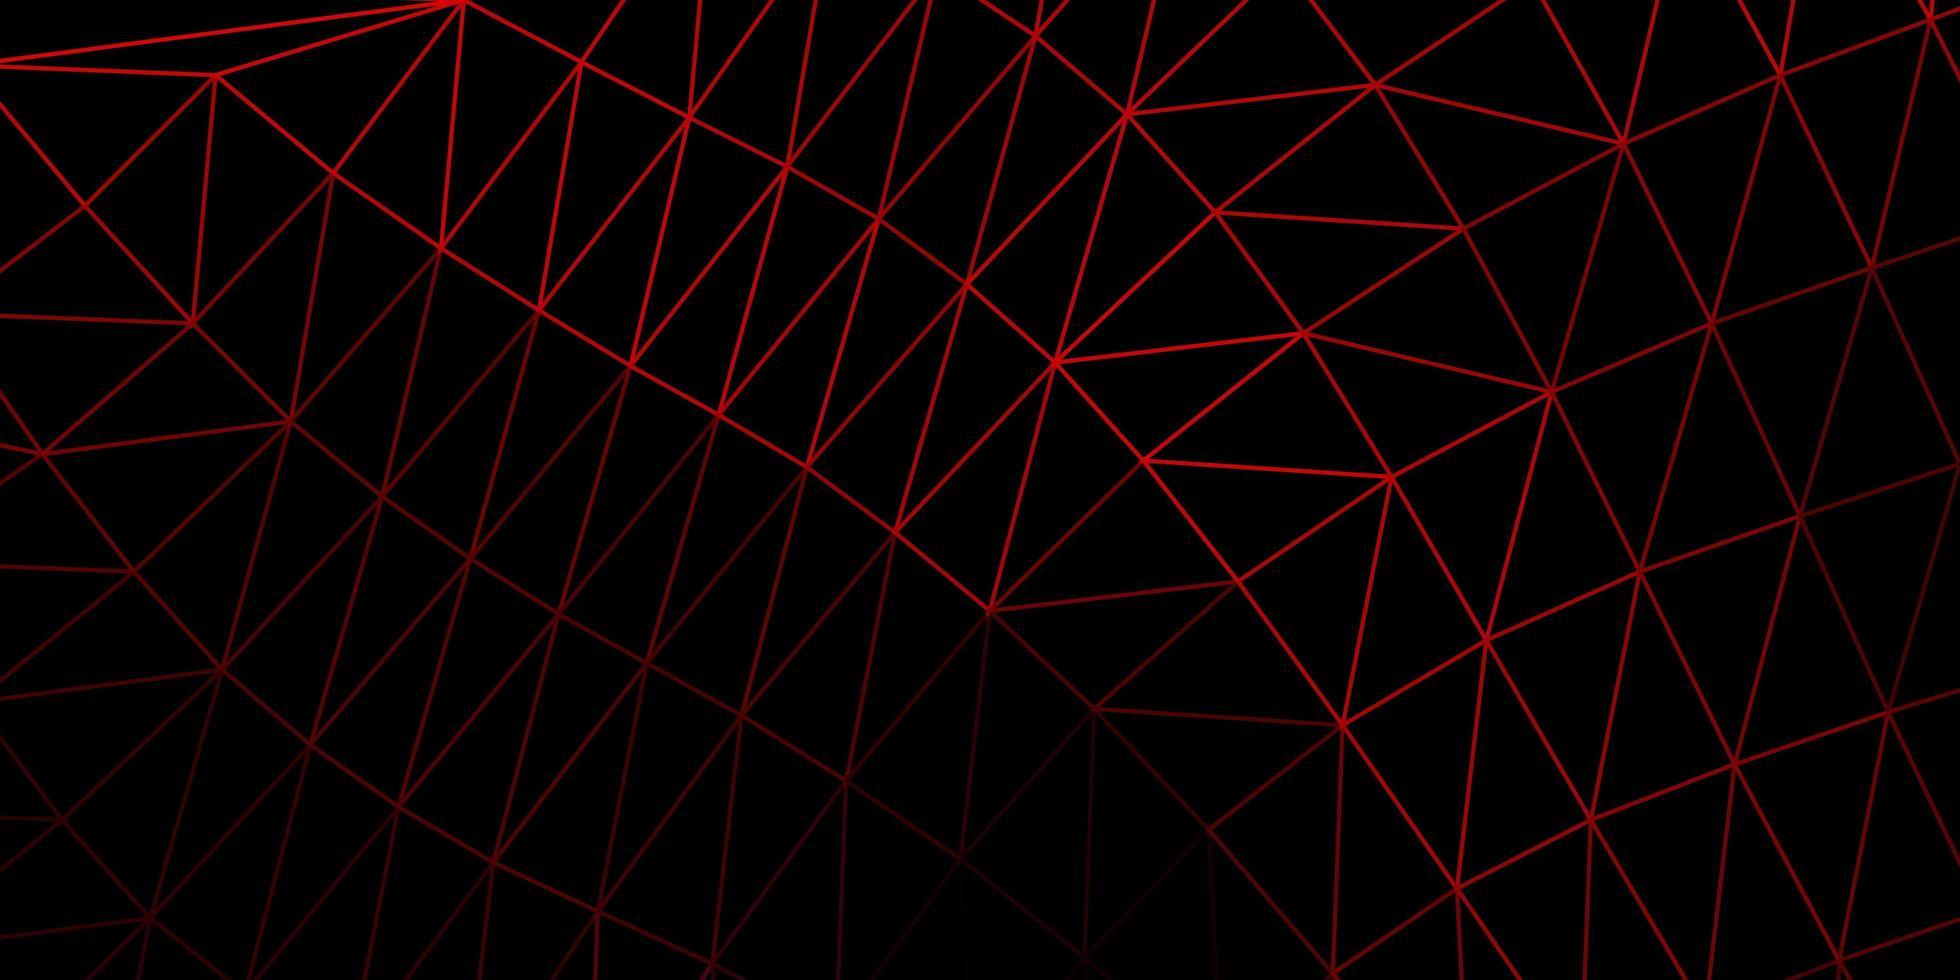 dunkelrote Poly-Dreieck-Textur. vektor